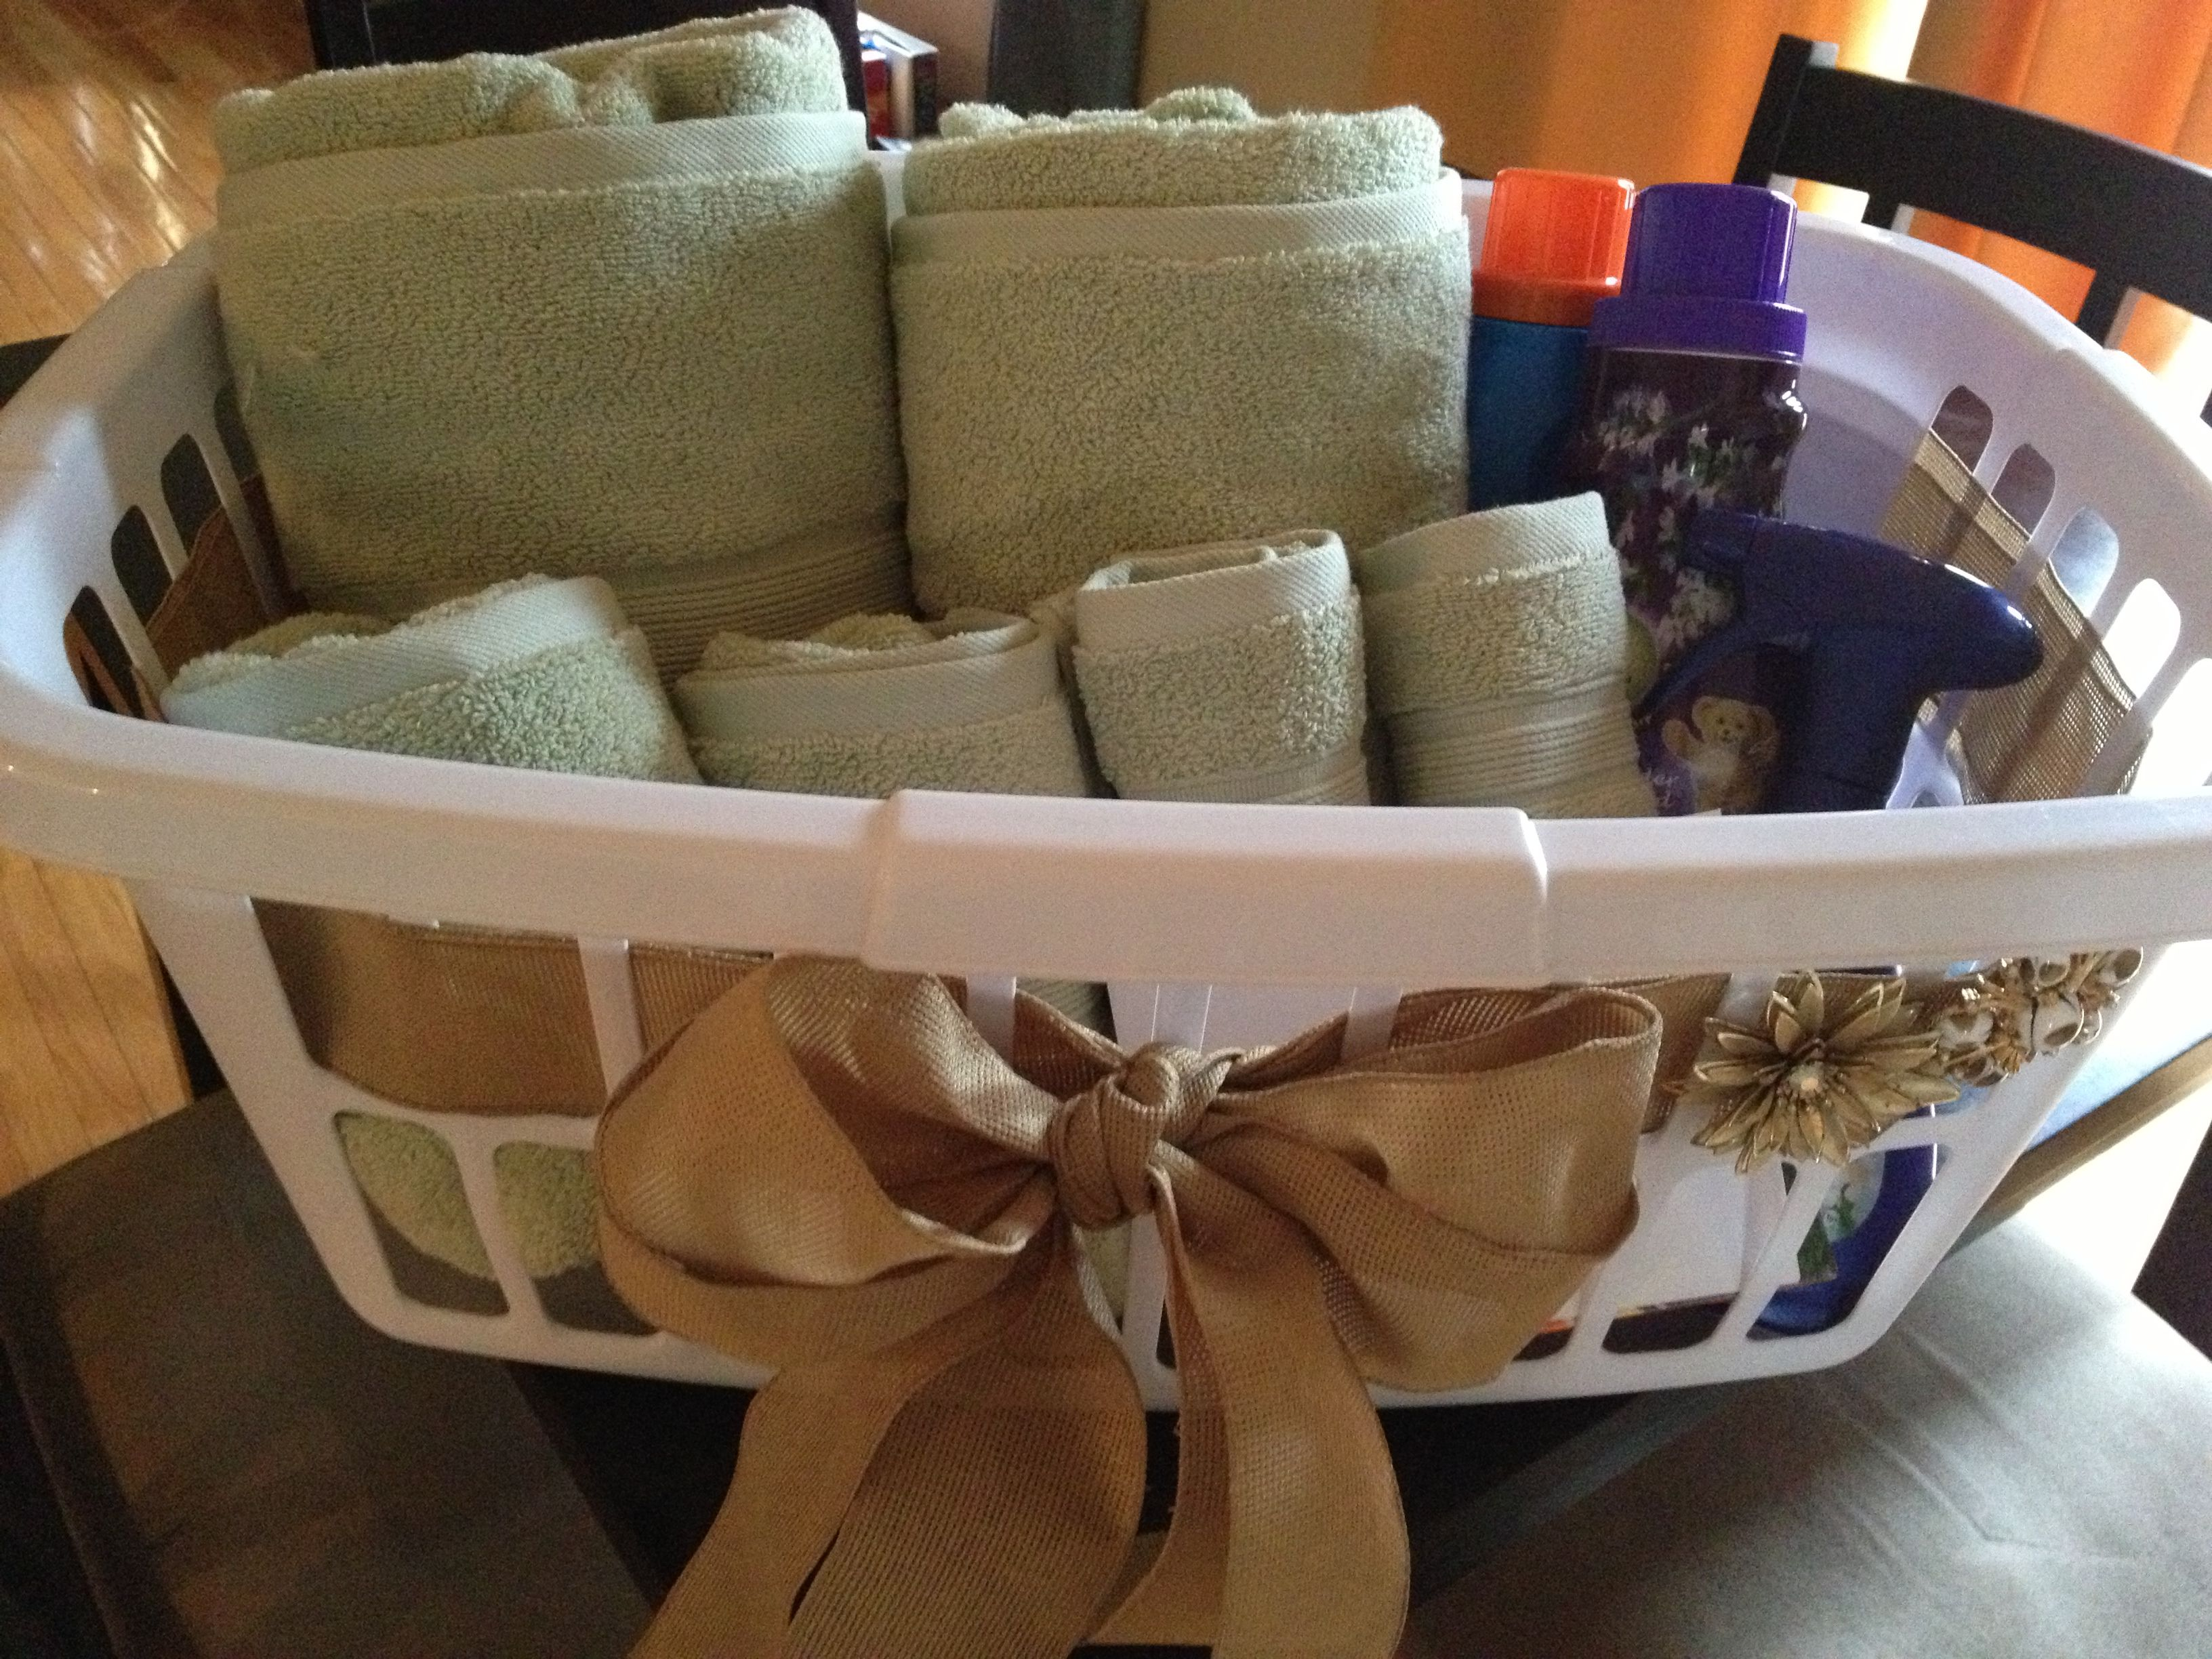 Bridal Shower Gift Laundry Basket Filled With Towels Detergent